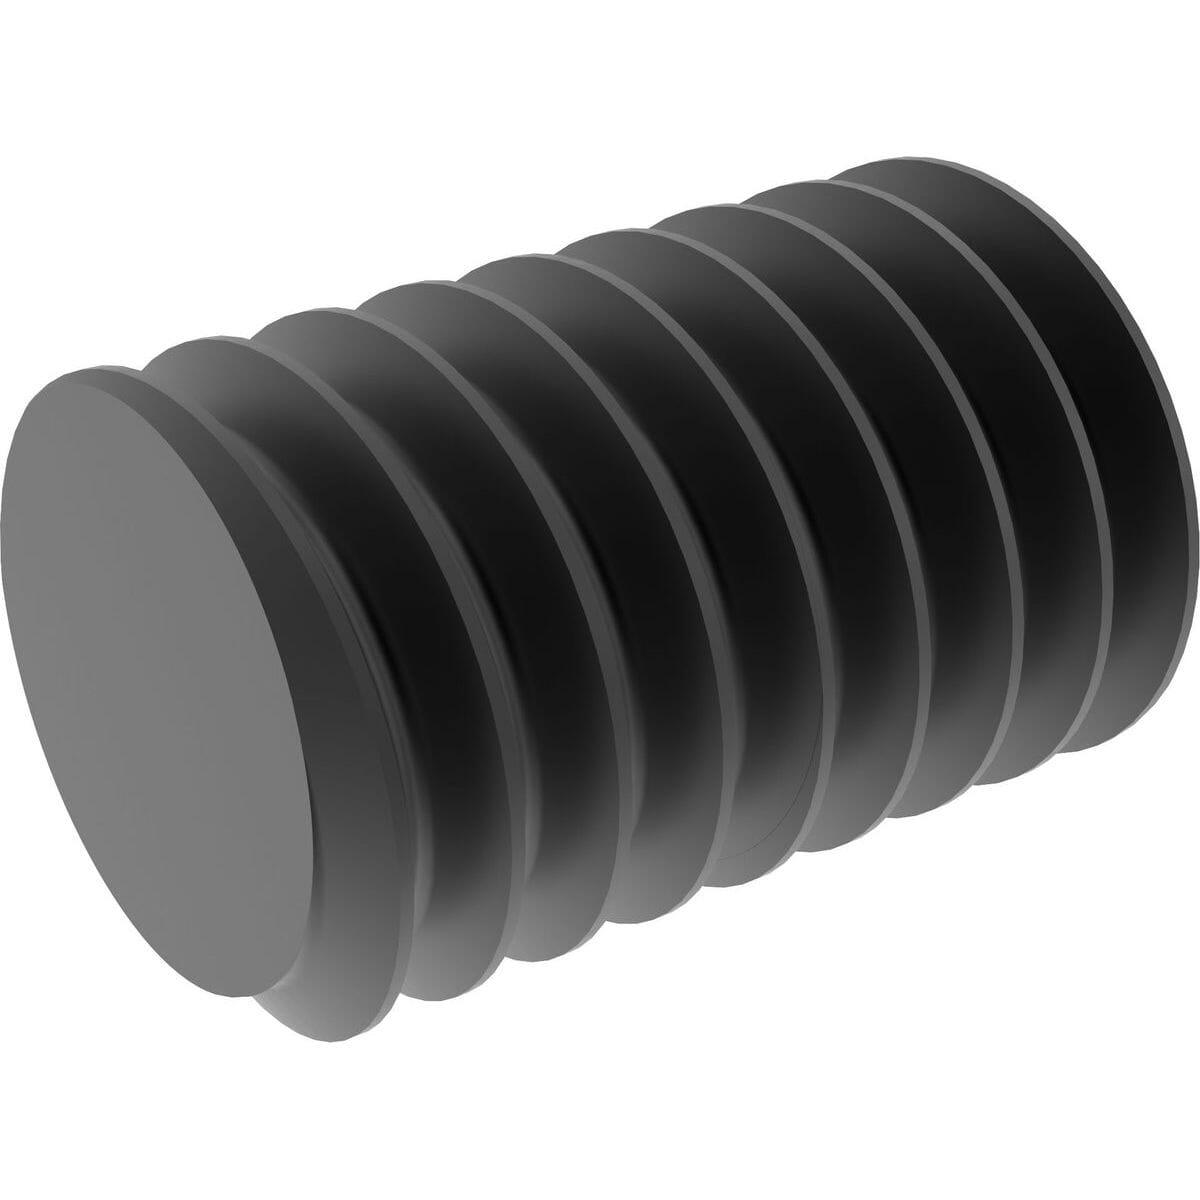 M4 x 16mm Flat Point Set / Grub Screws (DIN 913) - 14.9 Hardened Steel